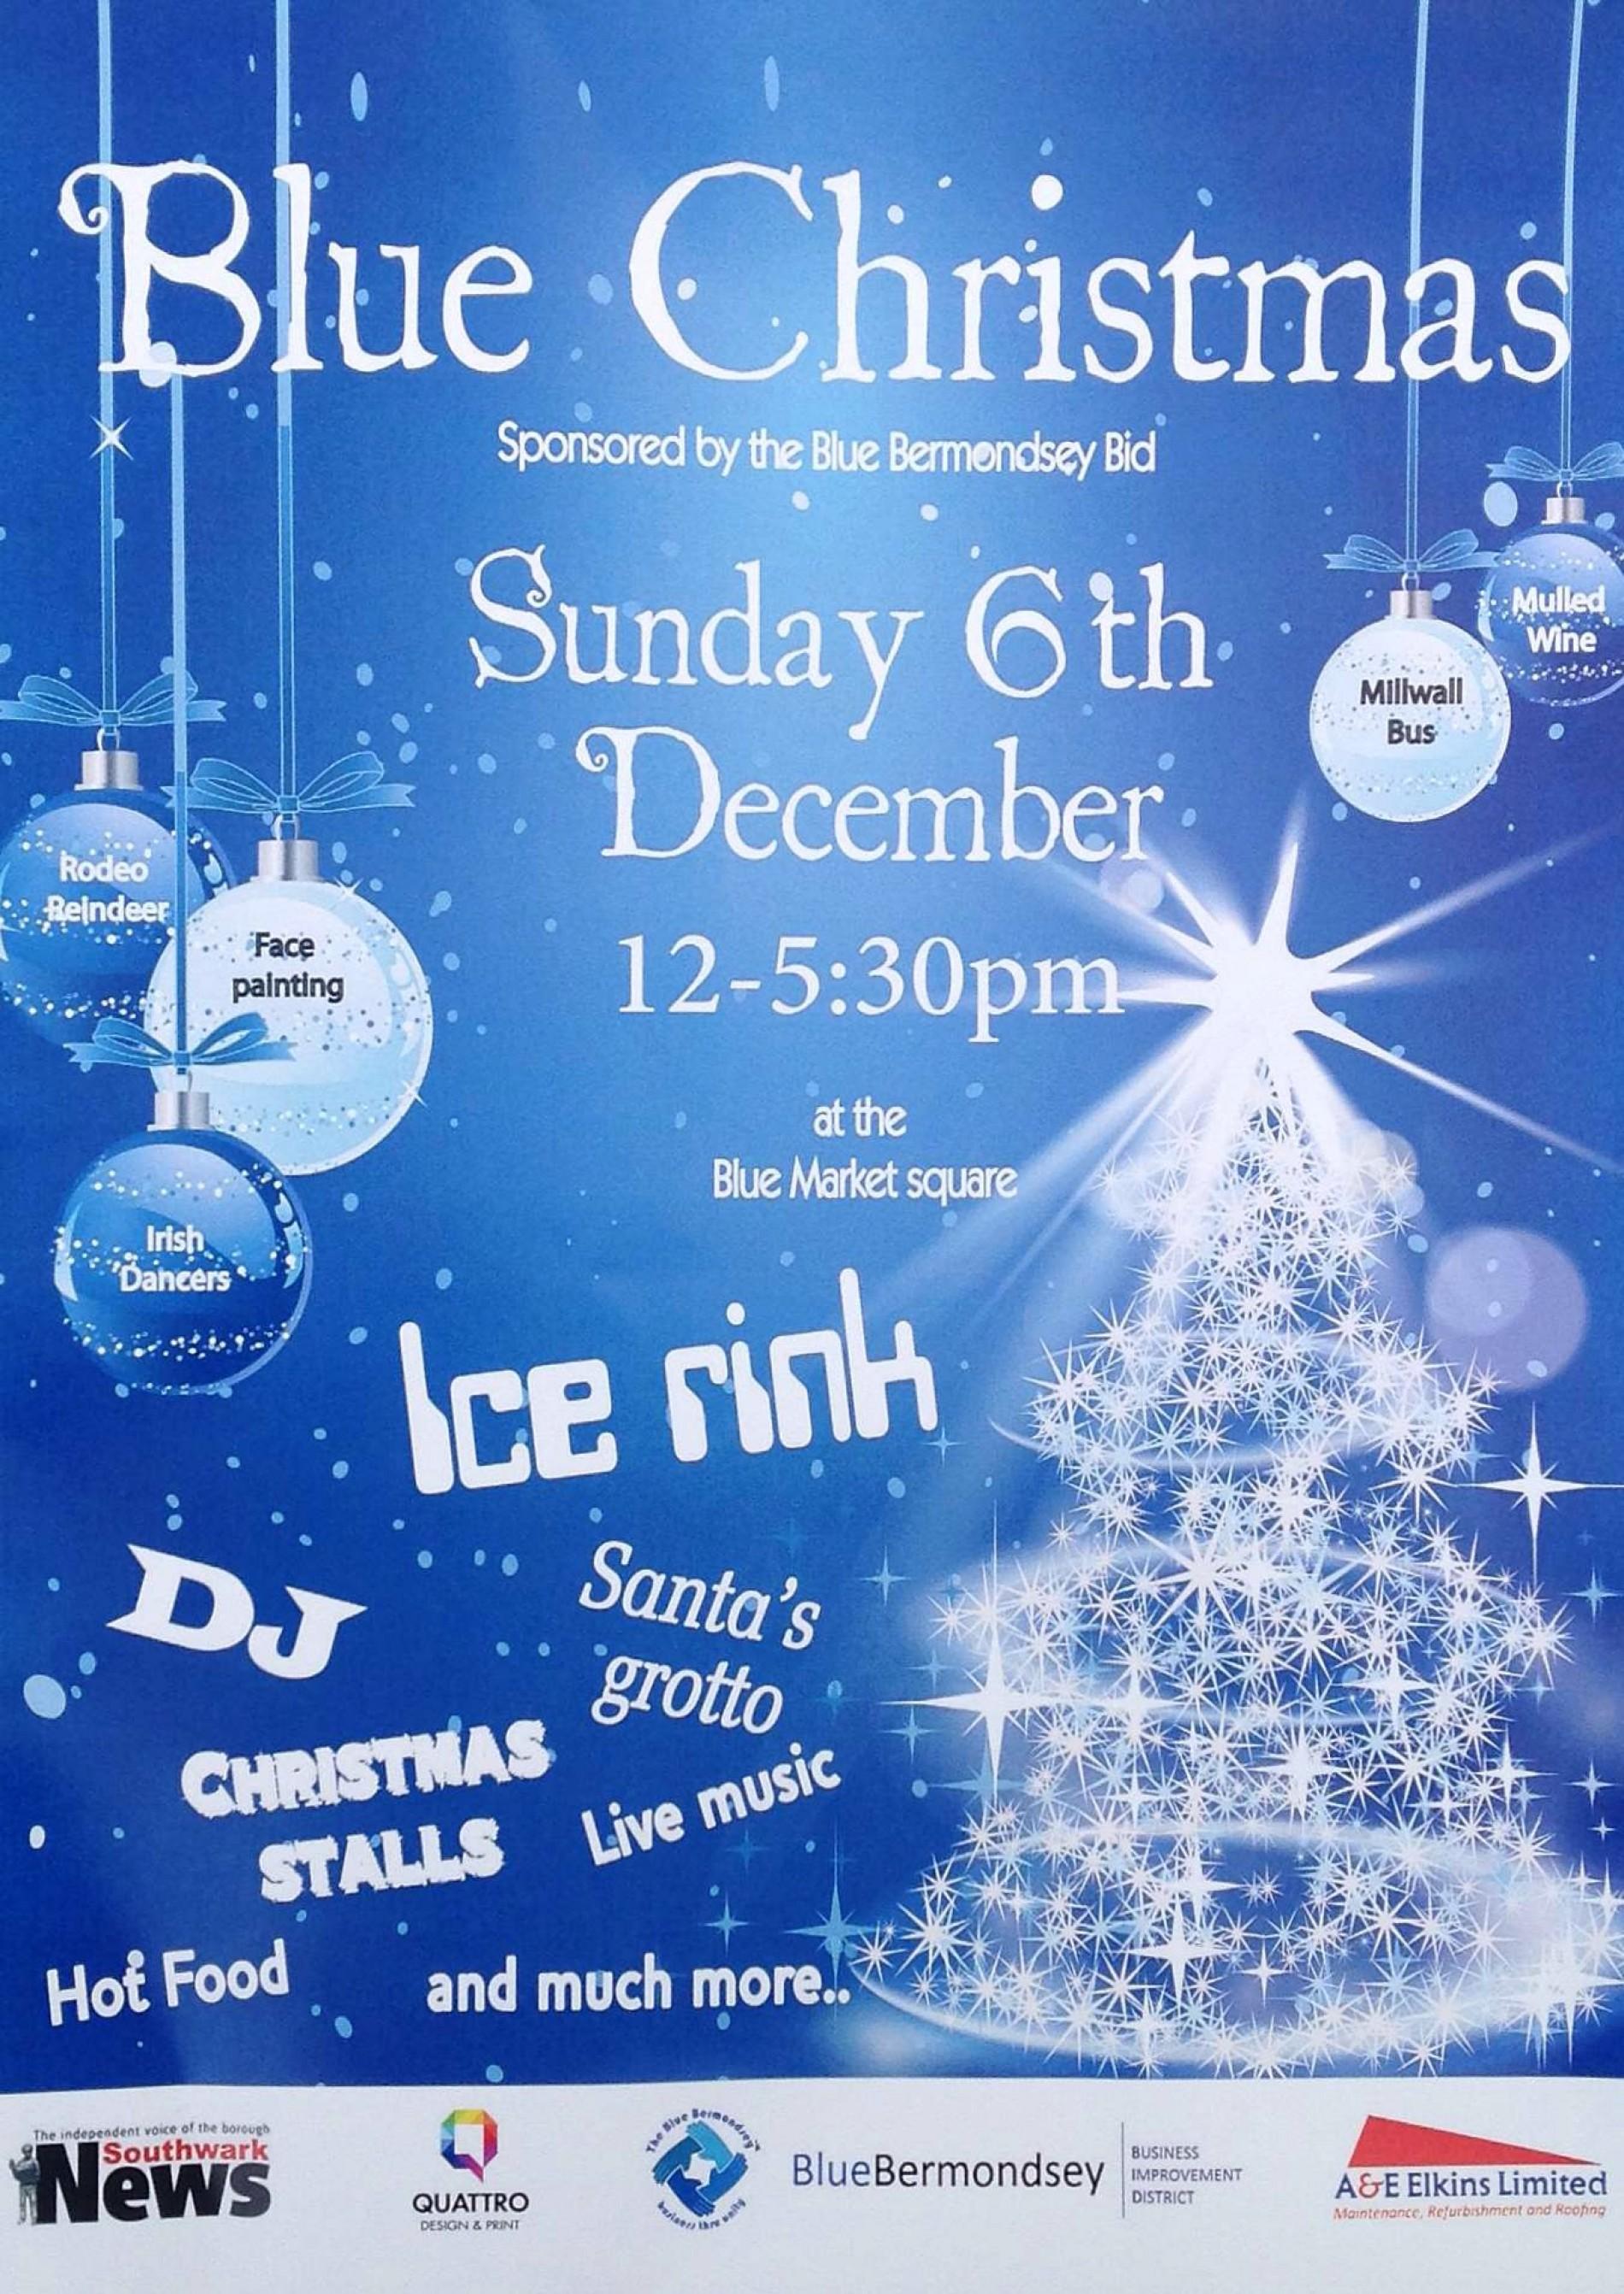 Blue Christmas at The Blue Market6 Dec